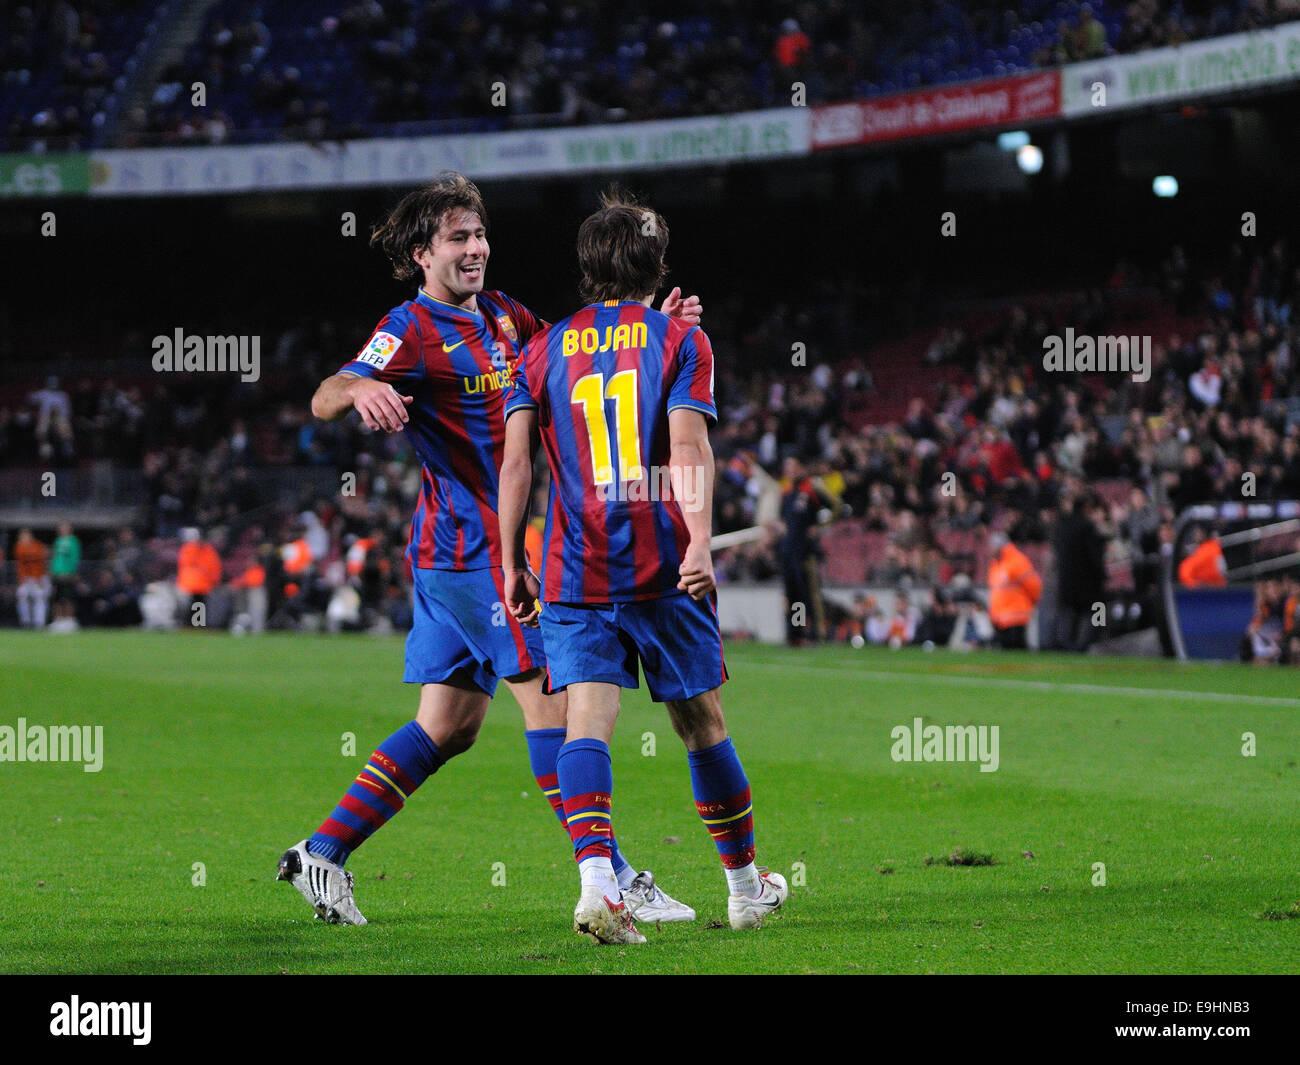 BARCELONA - NOV 10: Bojan Krkic, F.C Barcelona player, celebrates his goal against Cultural Leonesa at the Camp - Stock Image